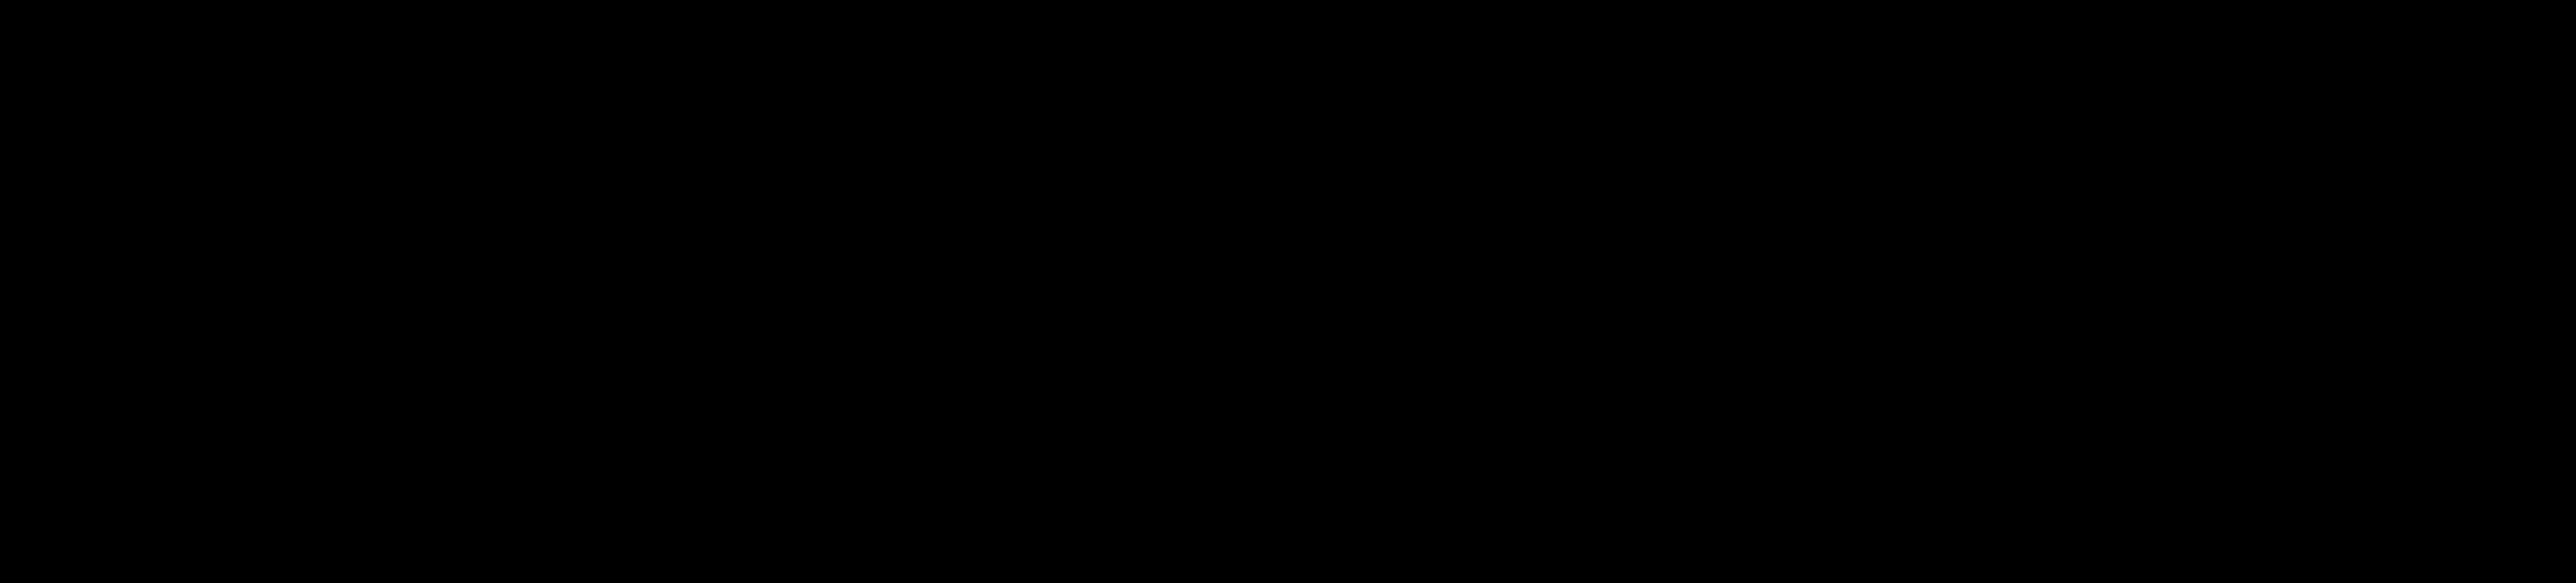 yamaha_logomark_2010_black